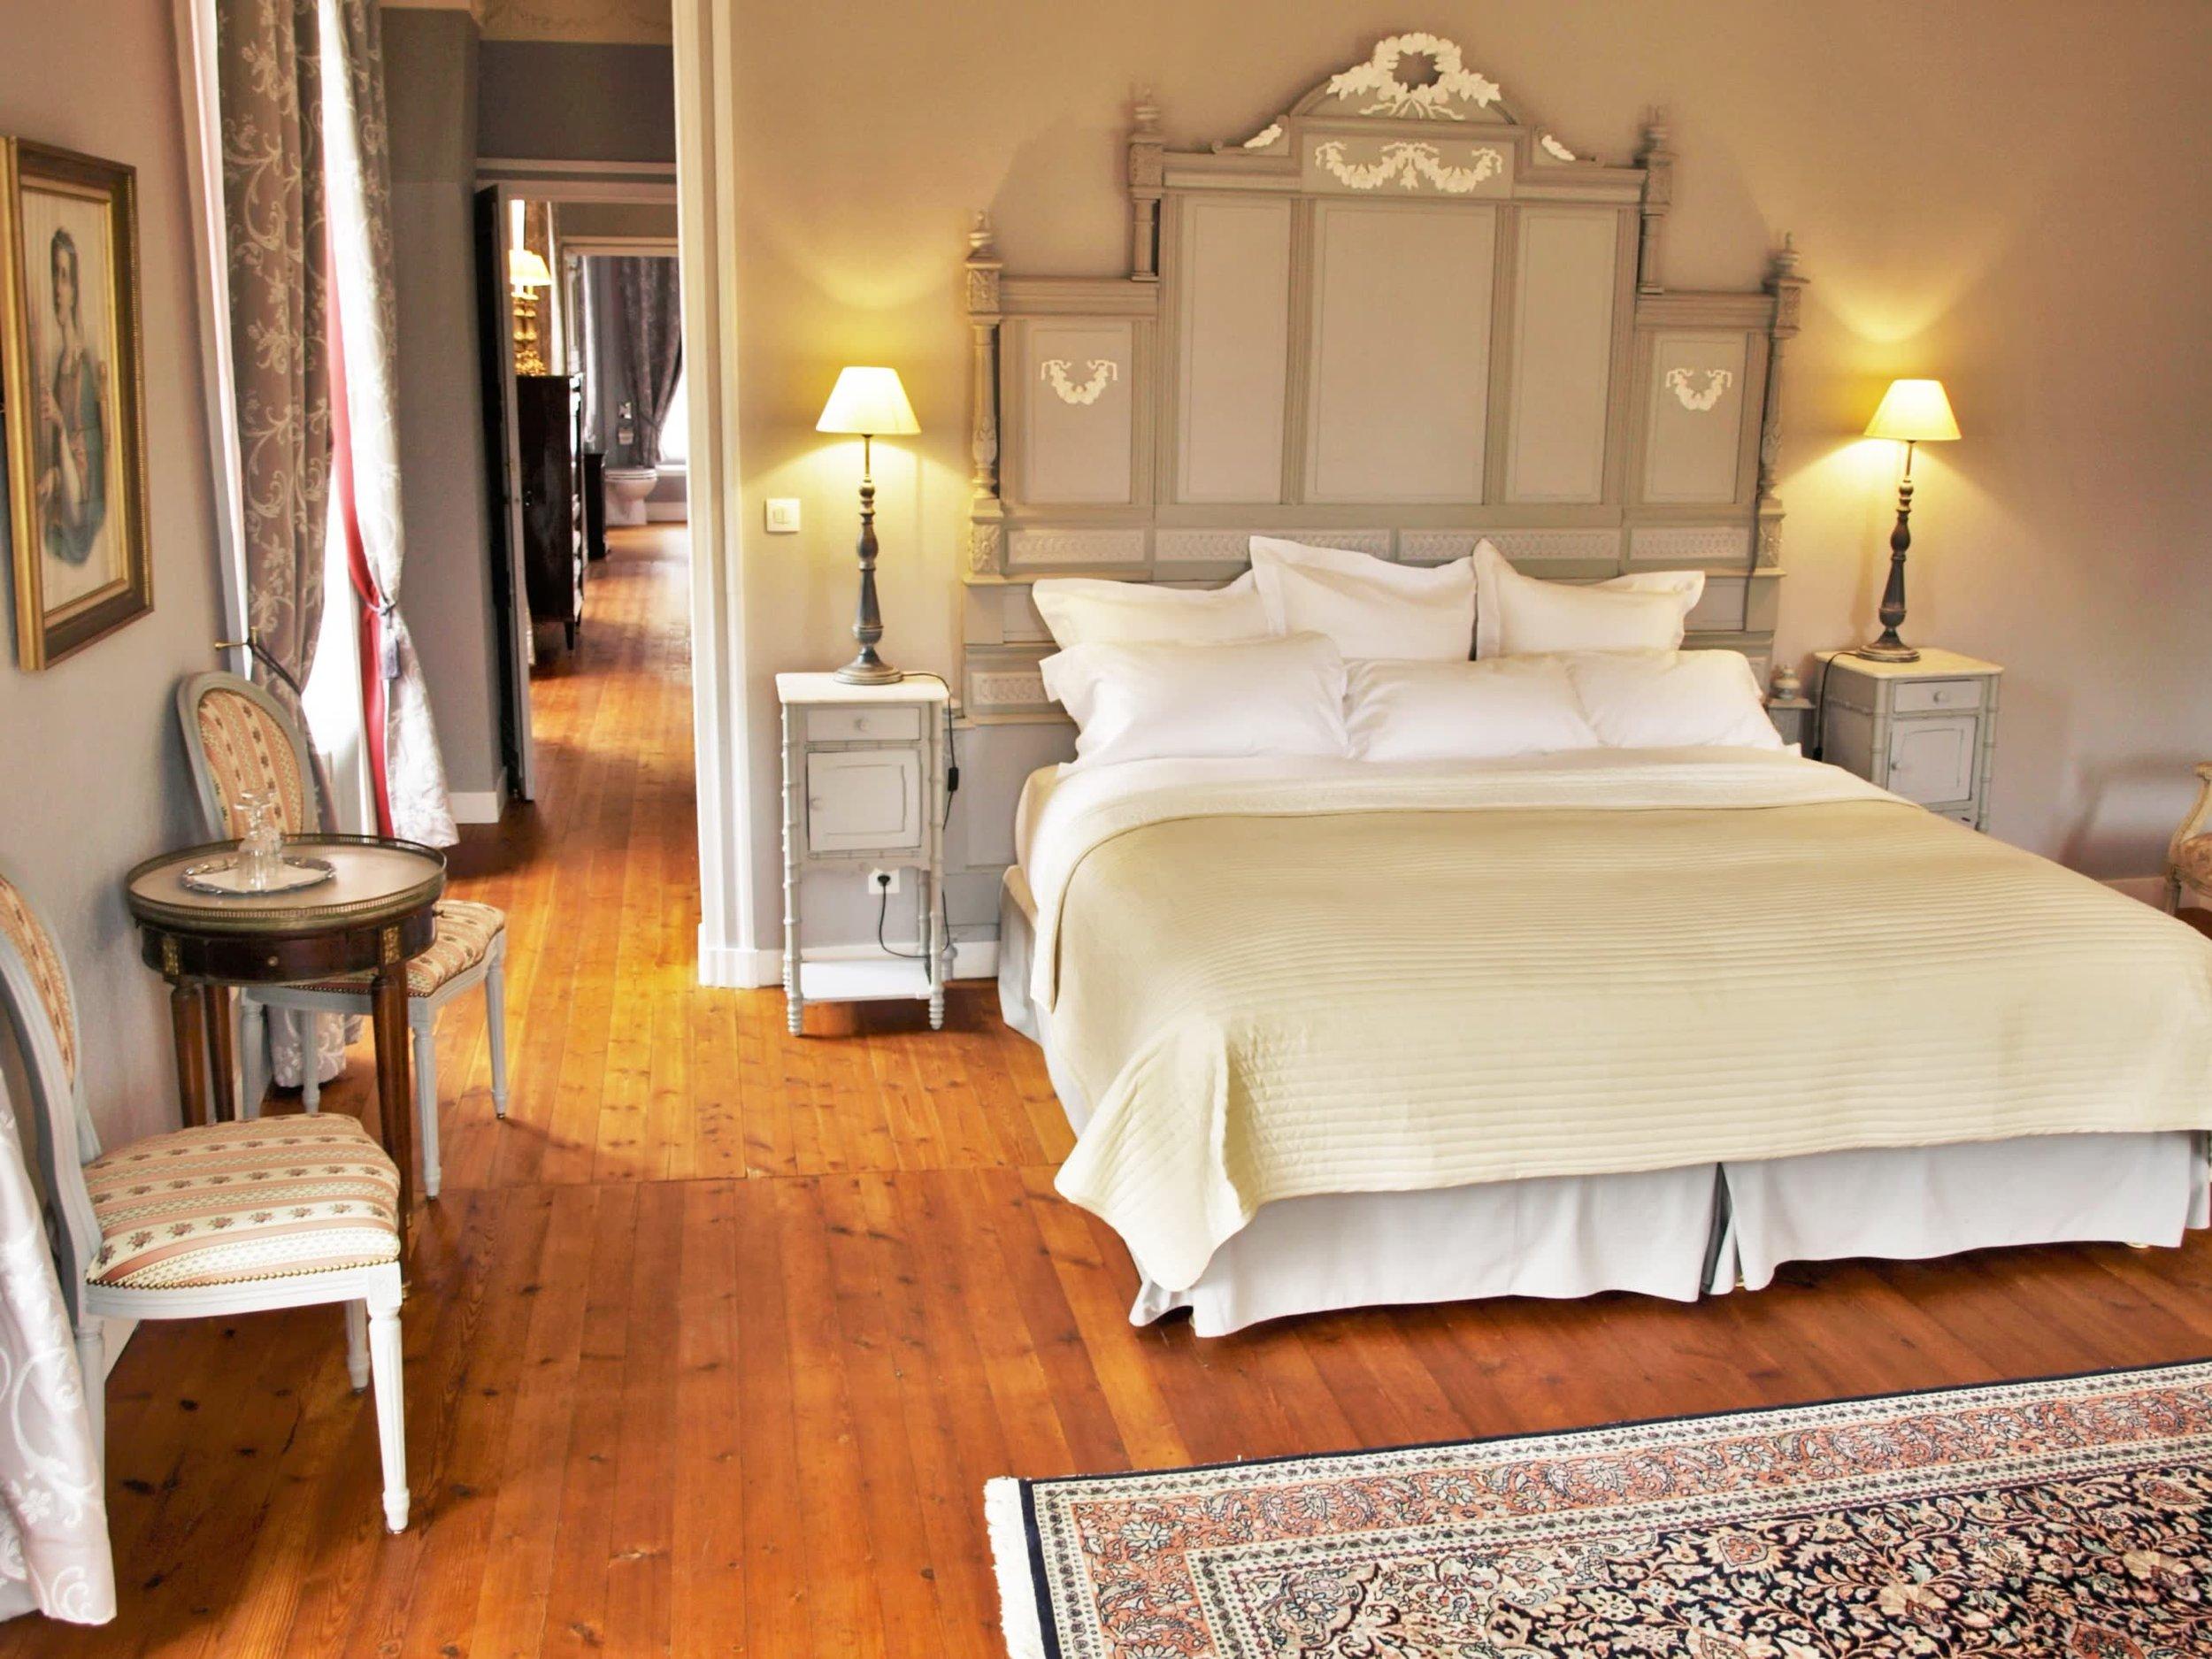 Chateau de la Pommeraye - charming boutique hotel chateau b&b spa normandy calvados bedroom Rubans 7(2).jpg